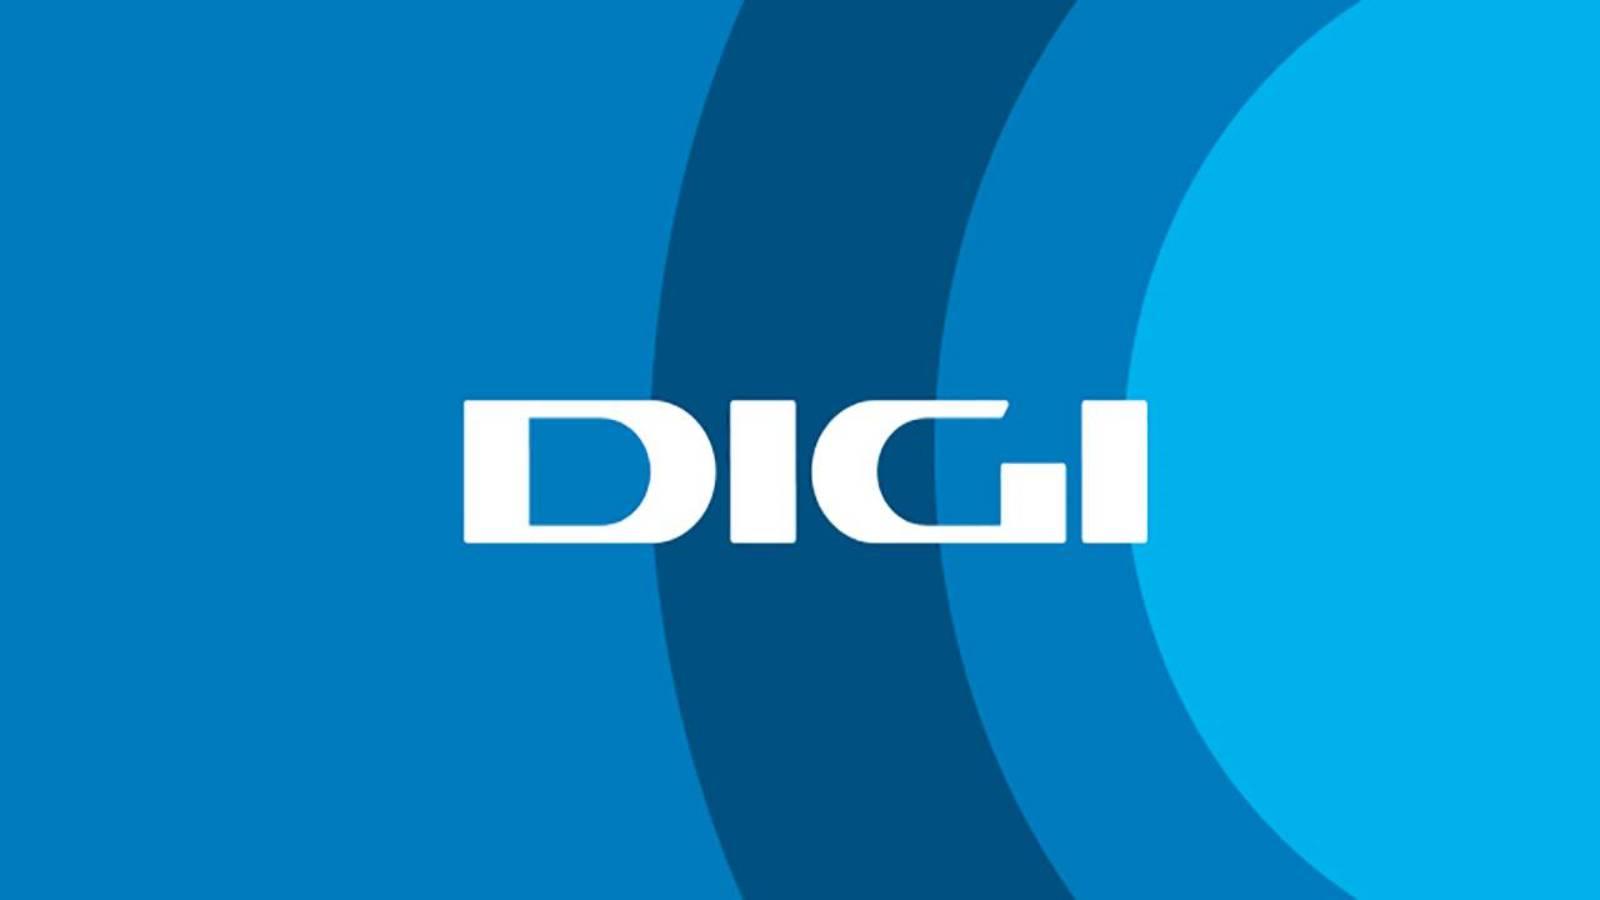 DIGI Romania logare digi online